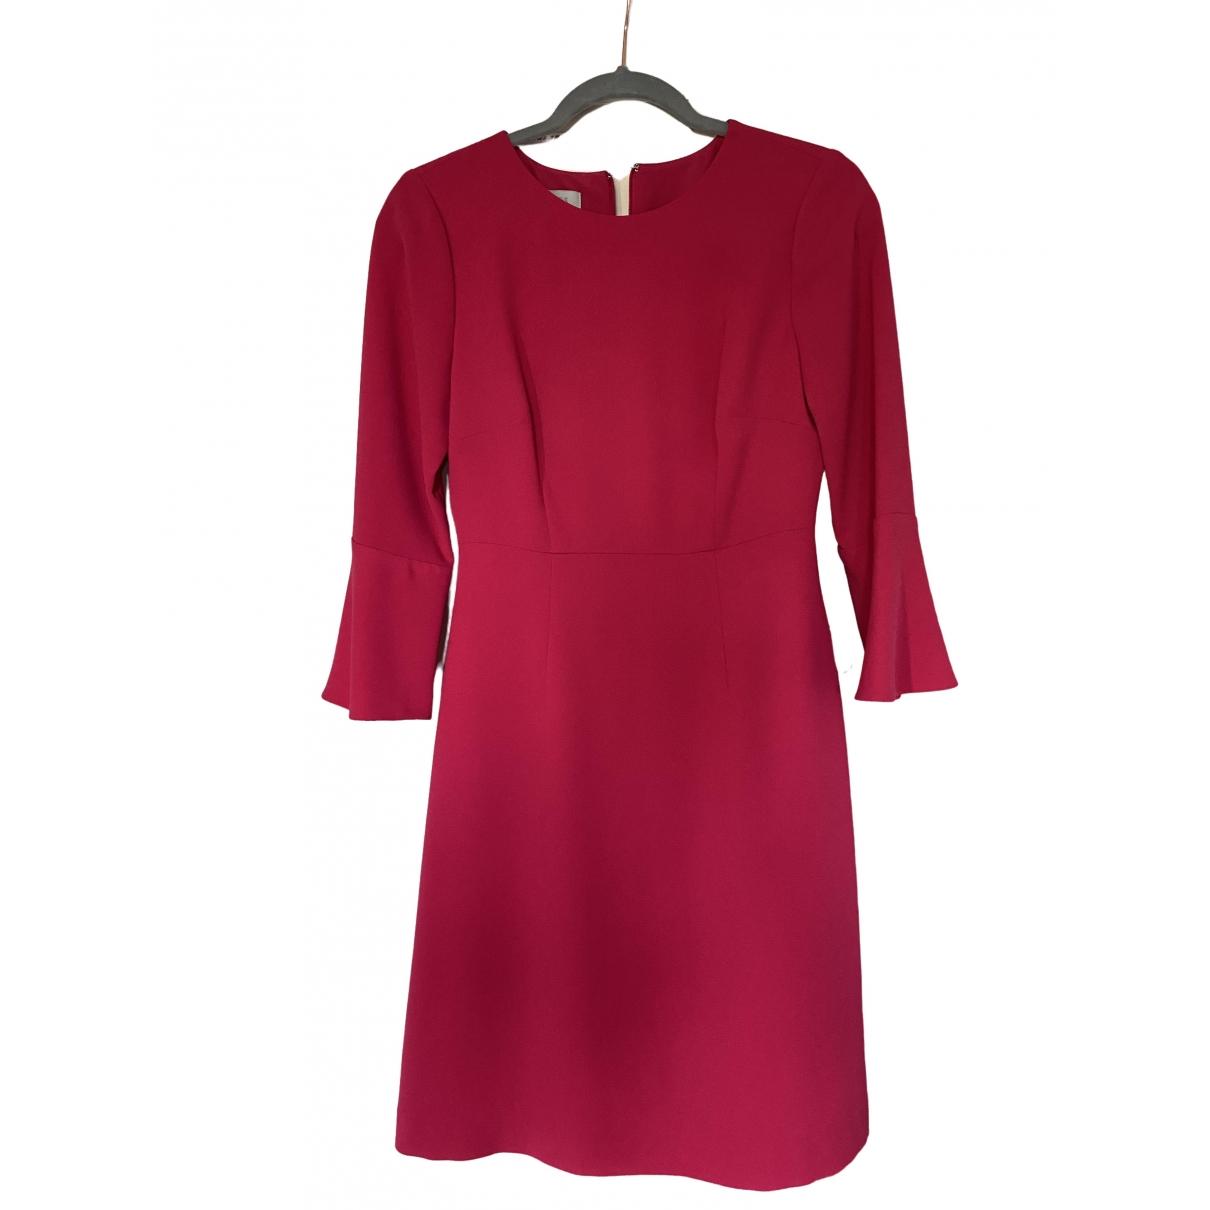 Hobbs \N Pink dress for Women 8 UK